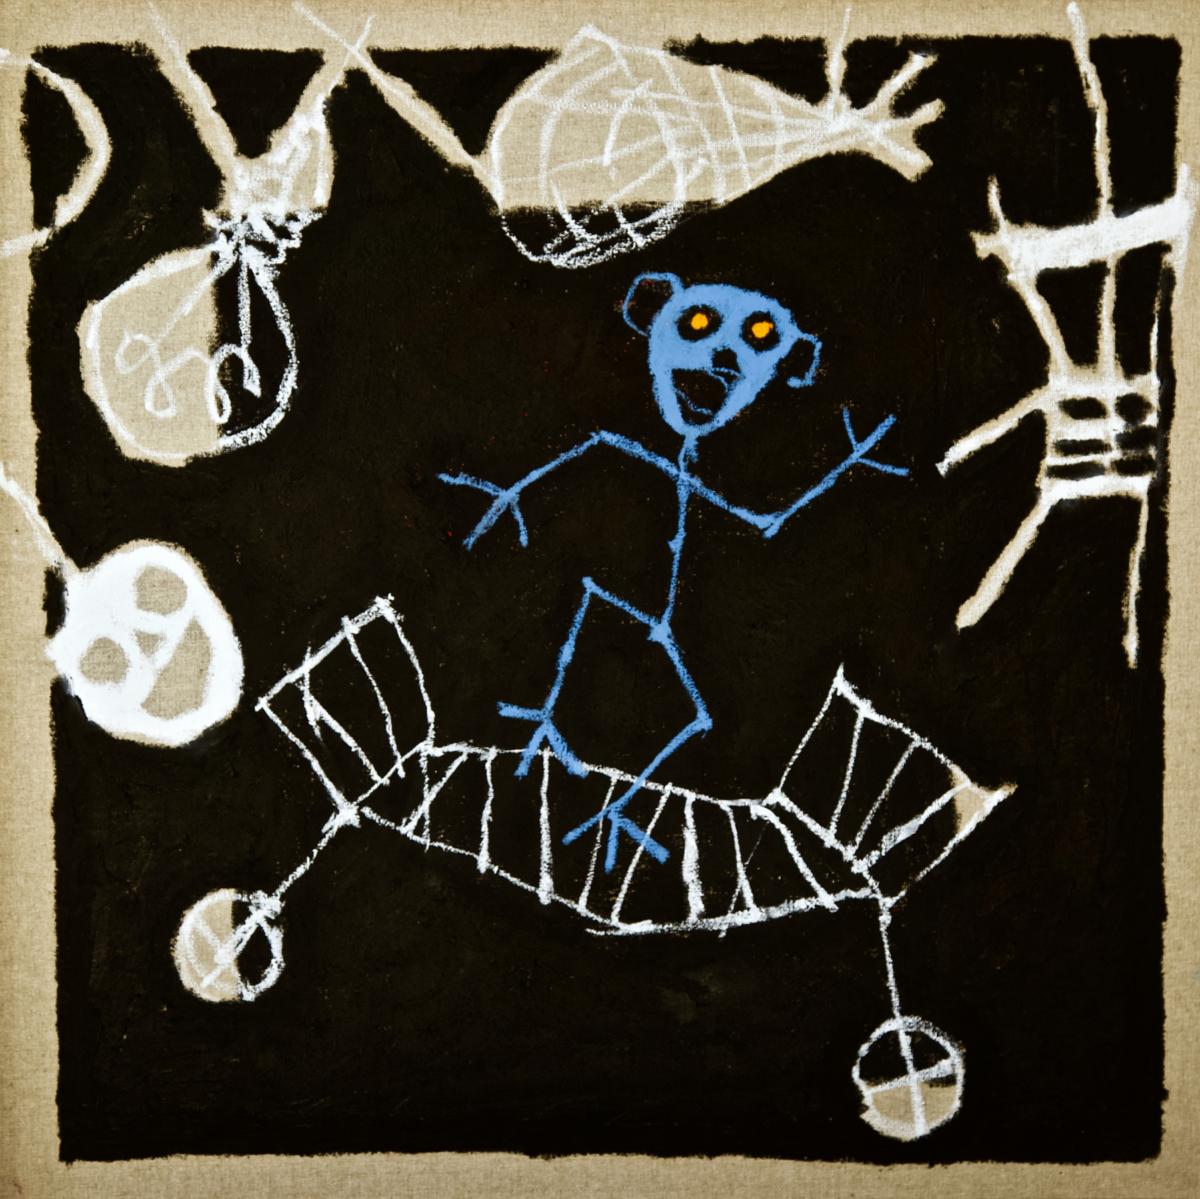 Dancing in the dark, 2021 peinture huile sur toile 50 x 50 cm RG-2103 ©ROCHEGAUSSEN